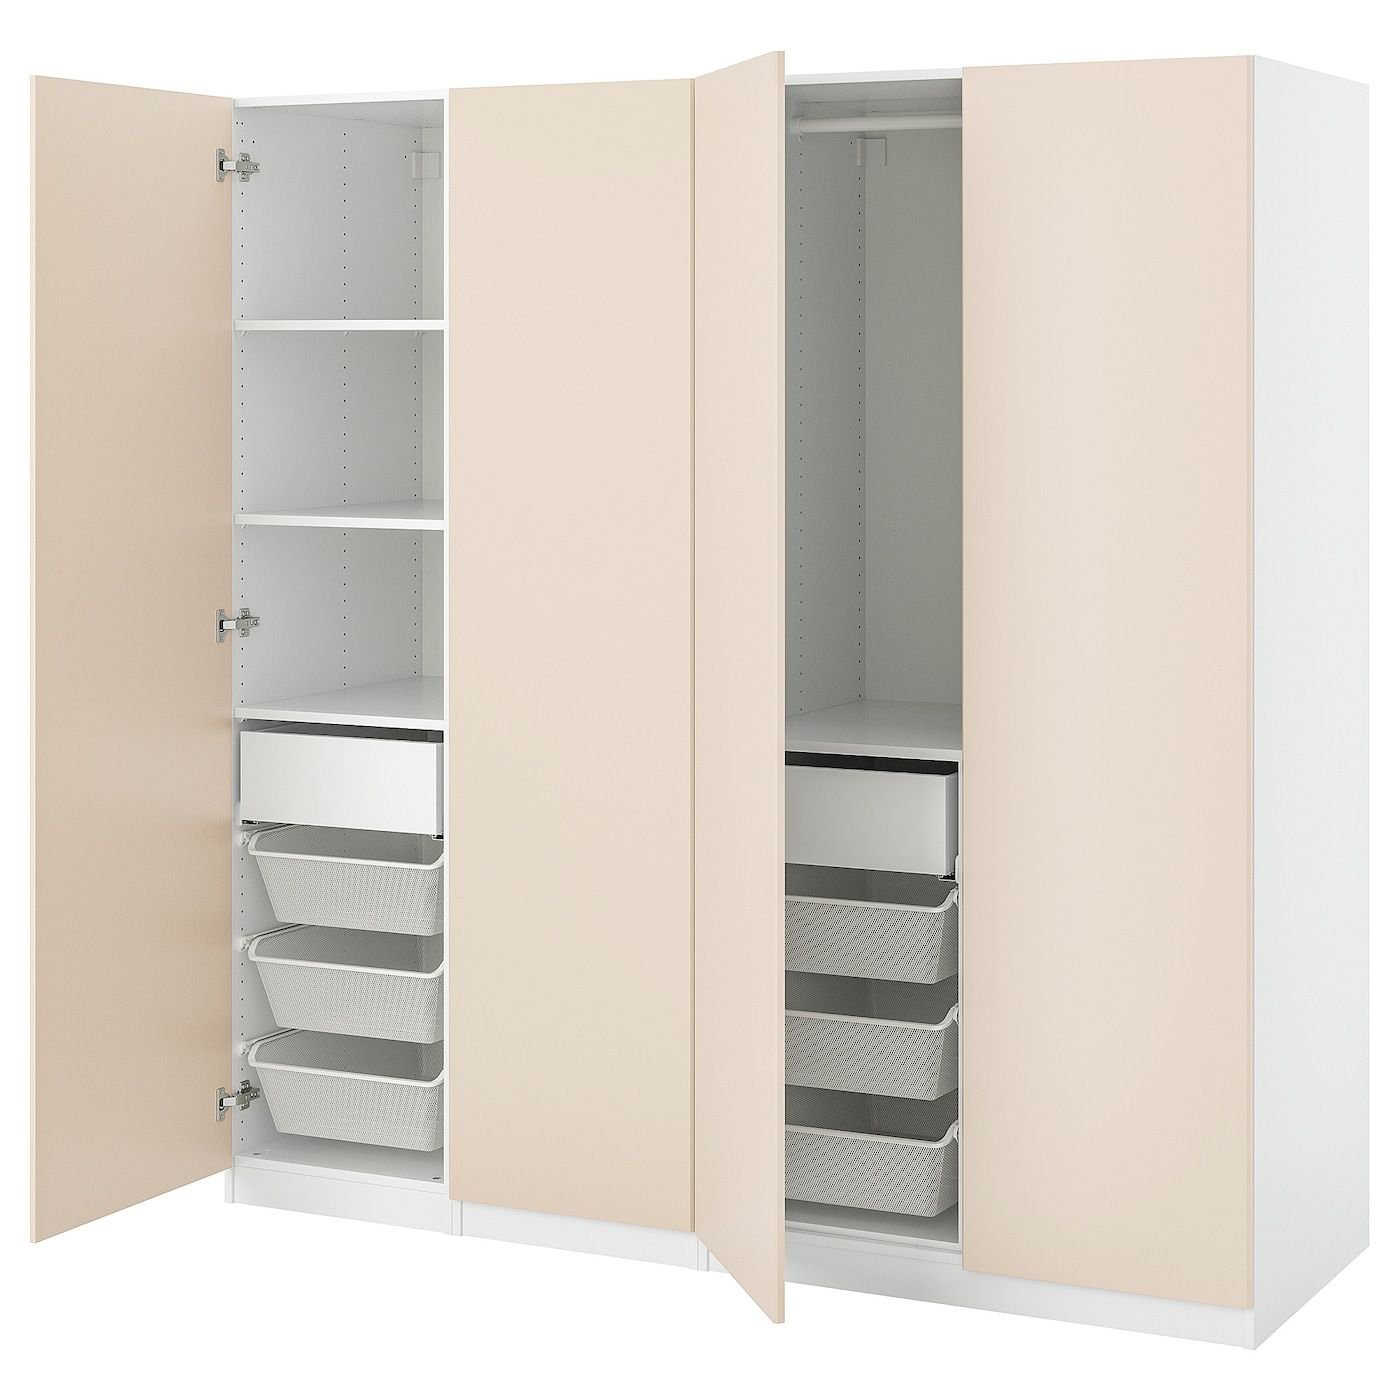 IKEA – PAX / REINSVOLL Wardrobe combination, gray-beige